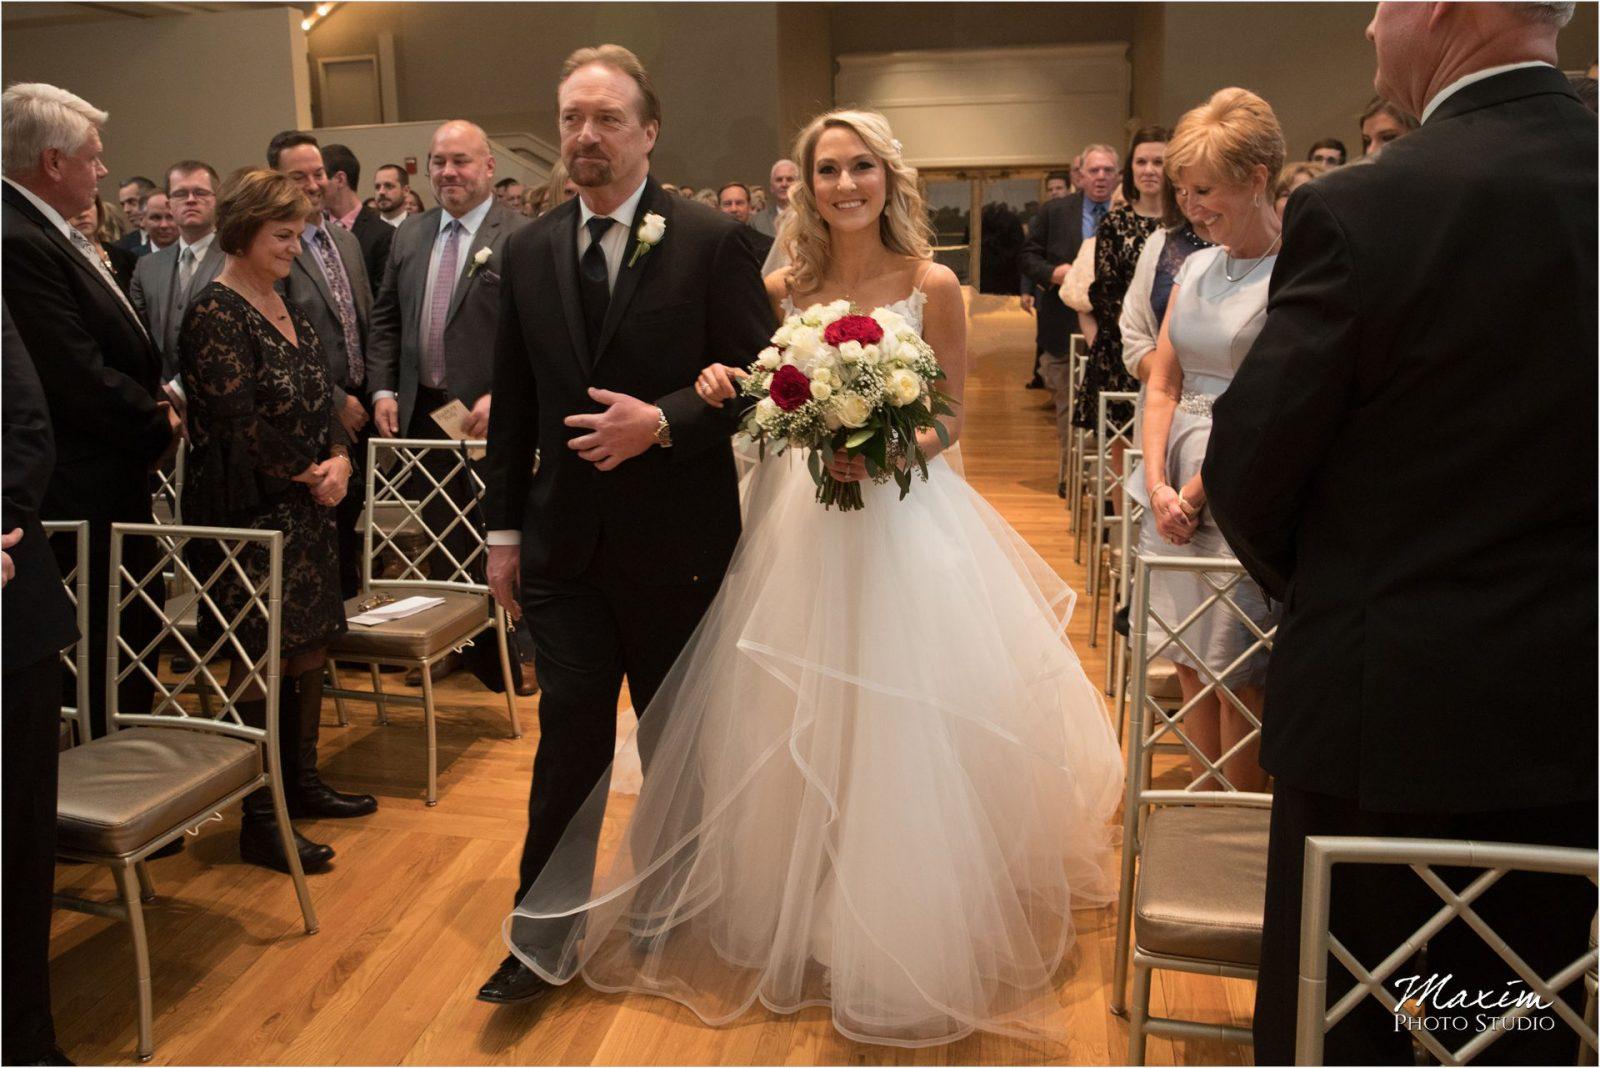 Cincinnati Music Hall Ballroom Wedding Ceremony Bride Groom